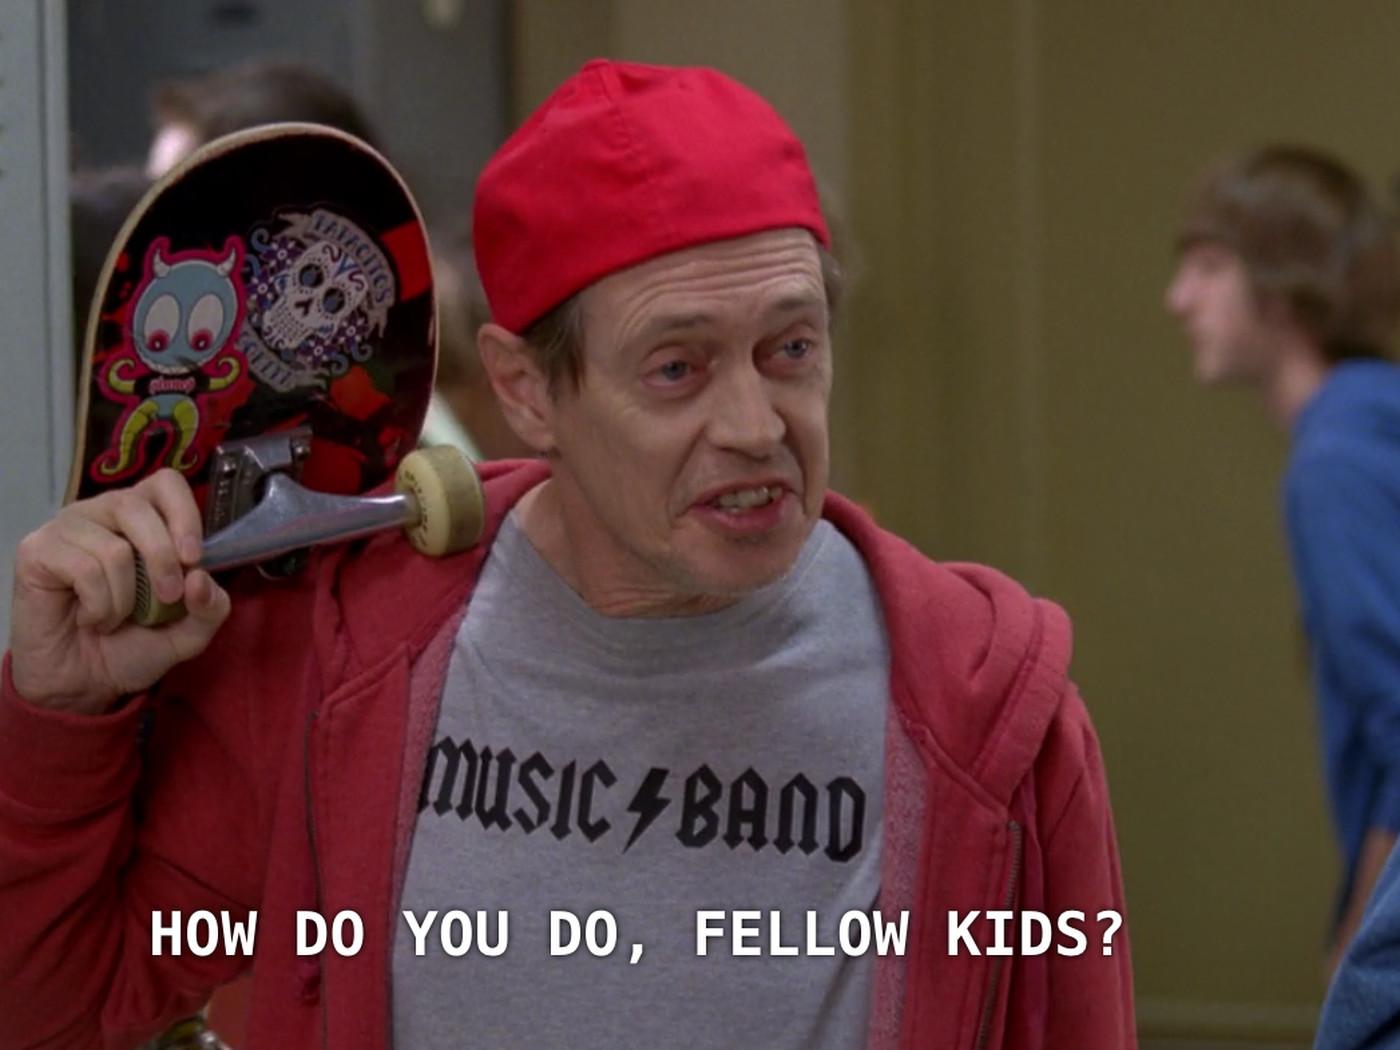 How do you do, fellow kids' has become the 'how do you do, fellow kids' of  memes - The Verge